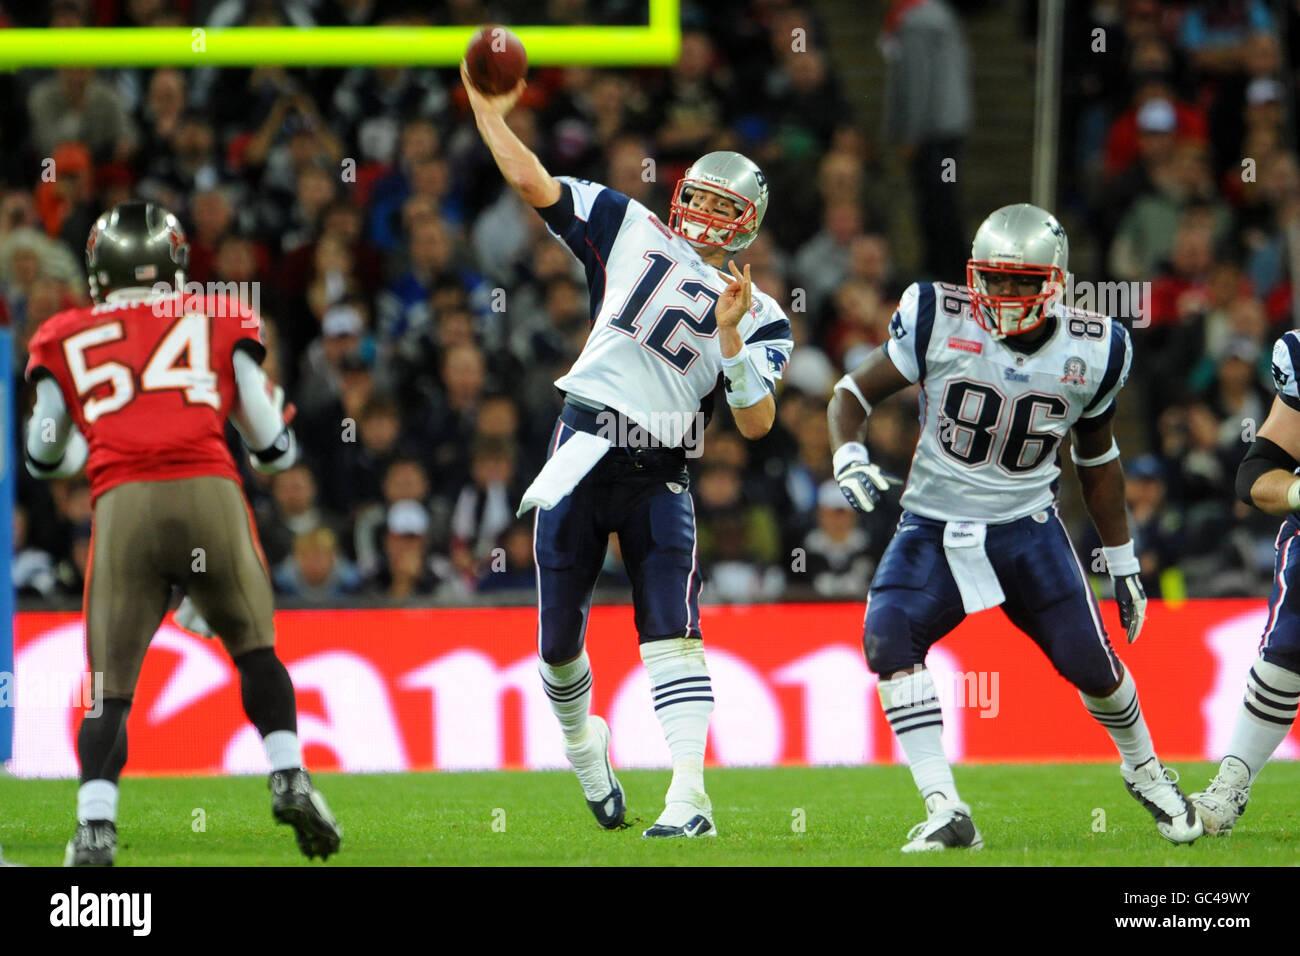 Football américain - NFL - New England Patriots v Tampa Bay Buccaneers - Stade de Wembley Photo Stock